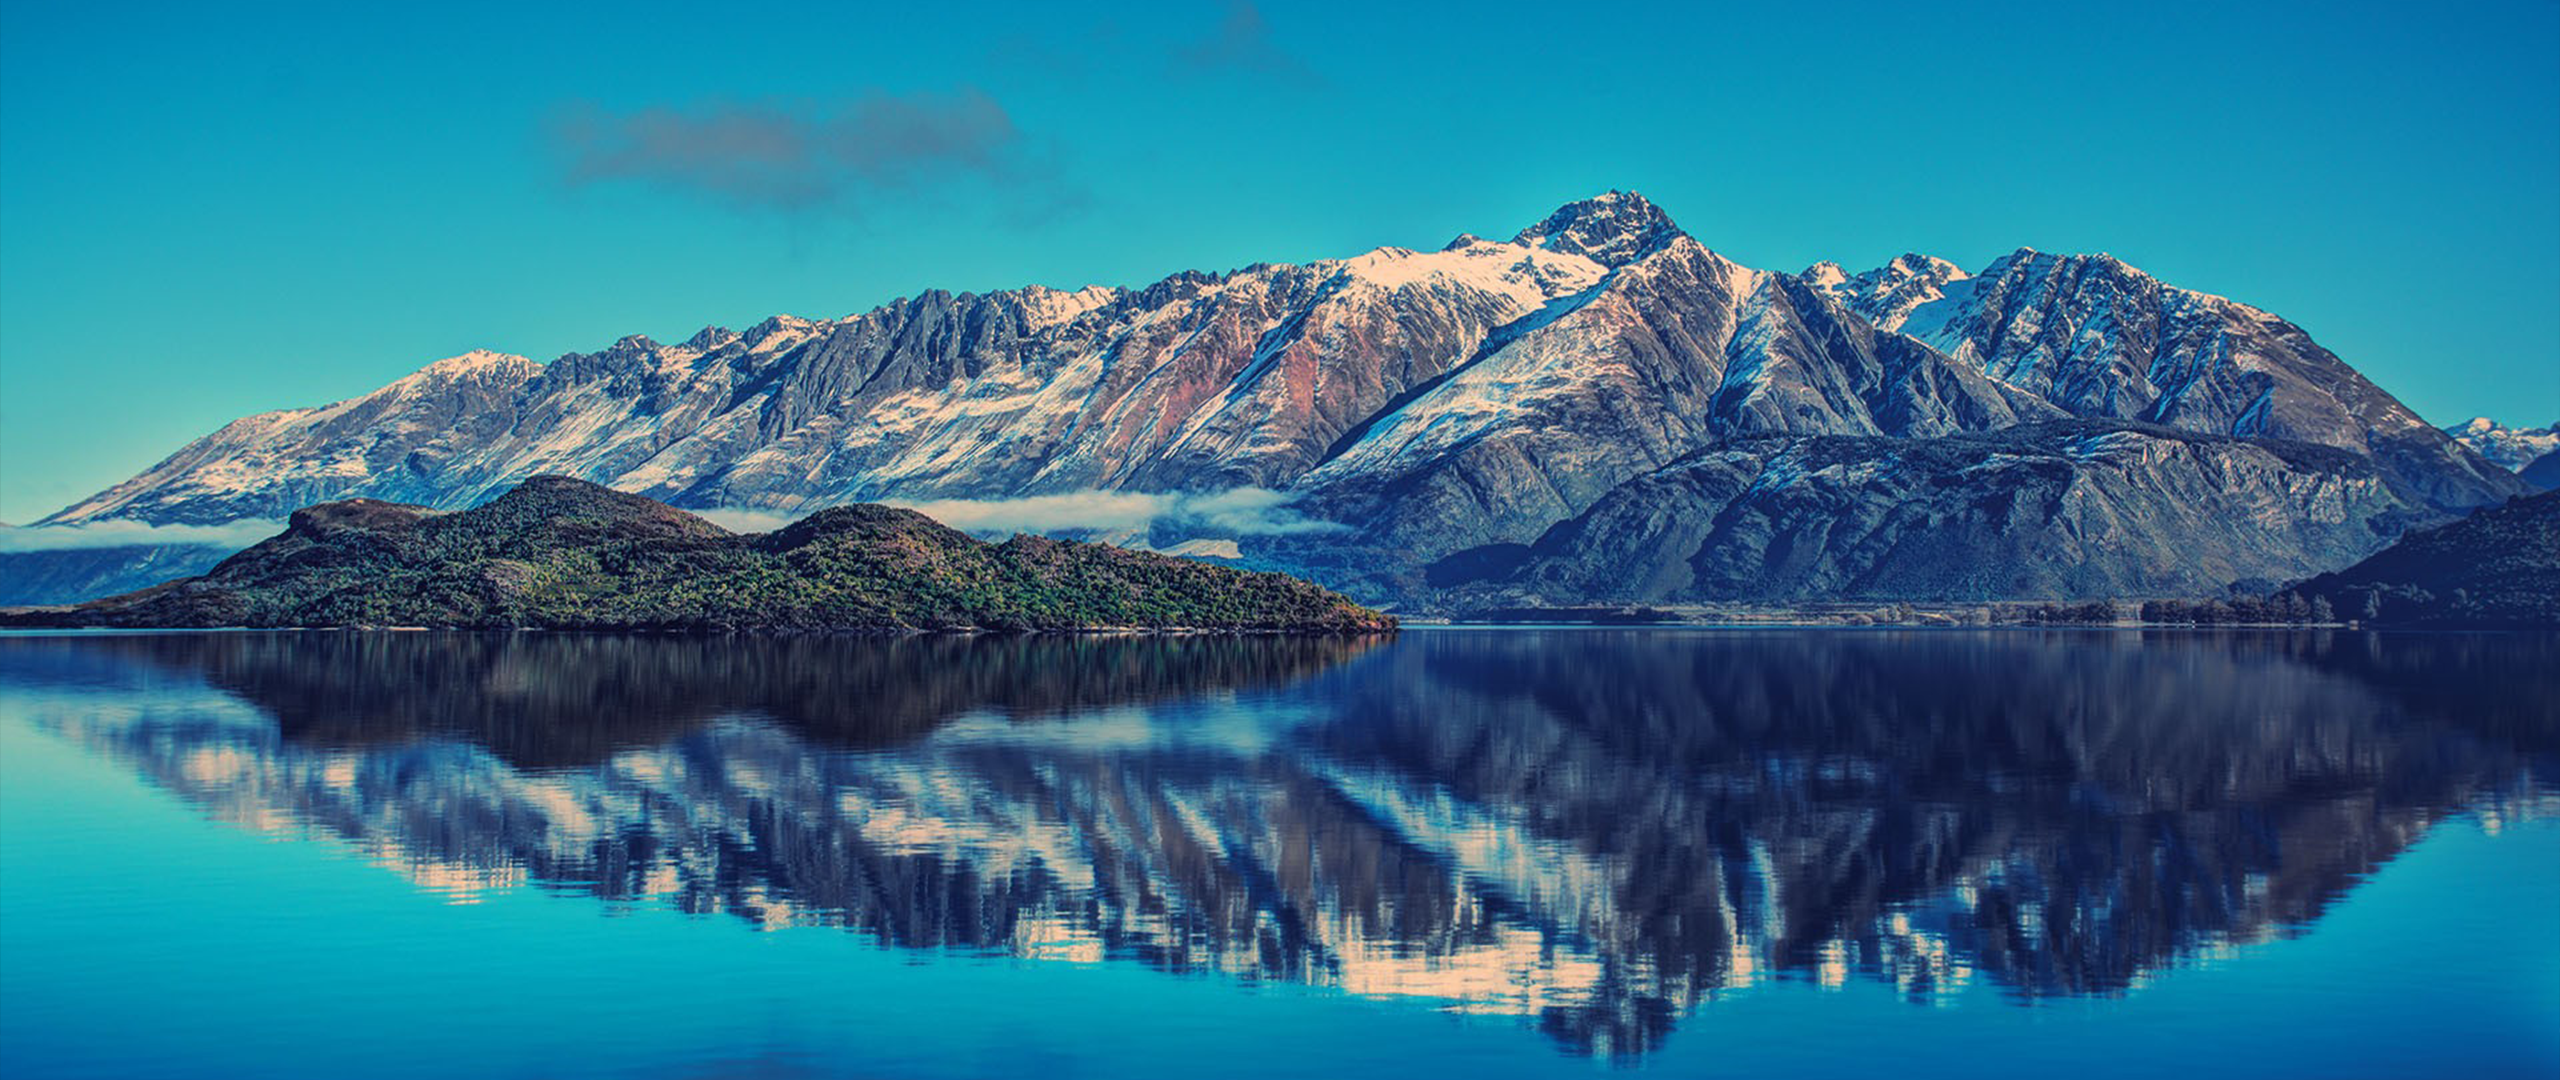 General 2560x1080 ultra-wide photography nature landscape mountains Lake Pukaki New Zealand